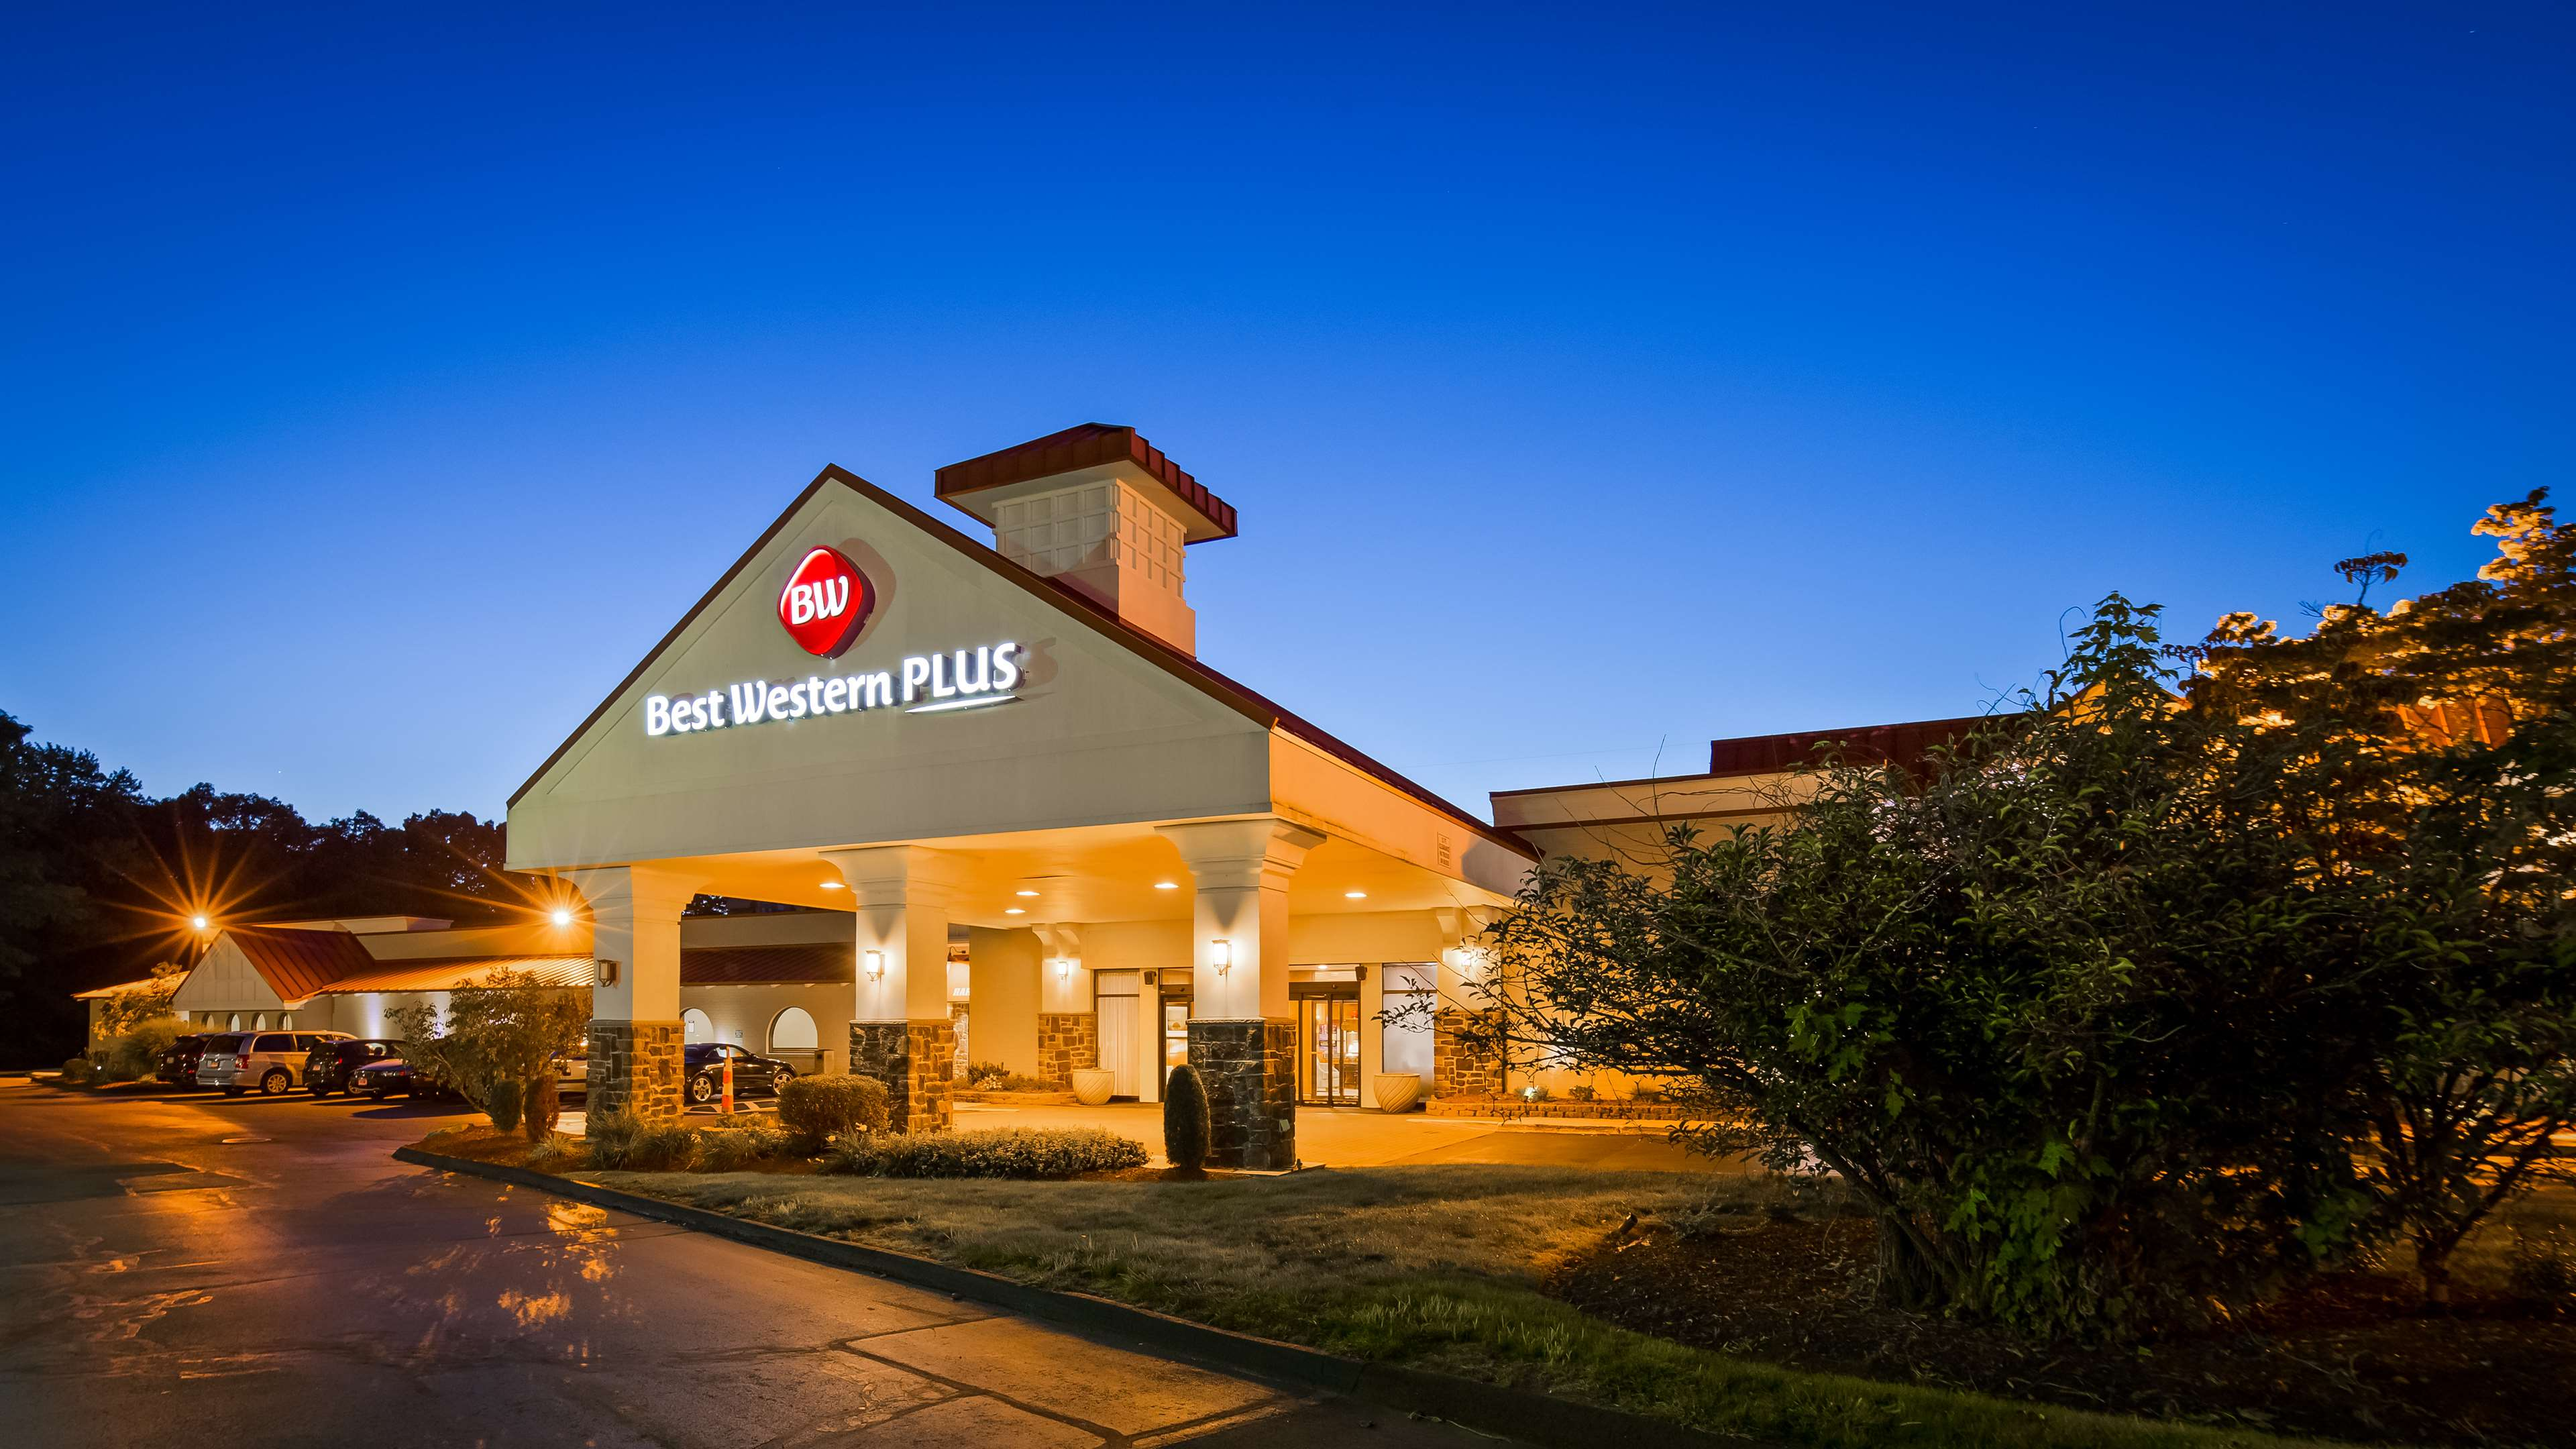 Best Western Plus North Haven Hotel image 1